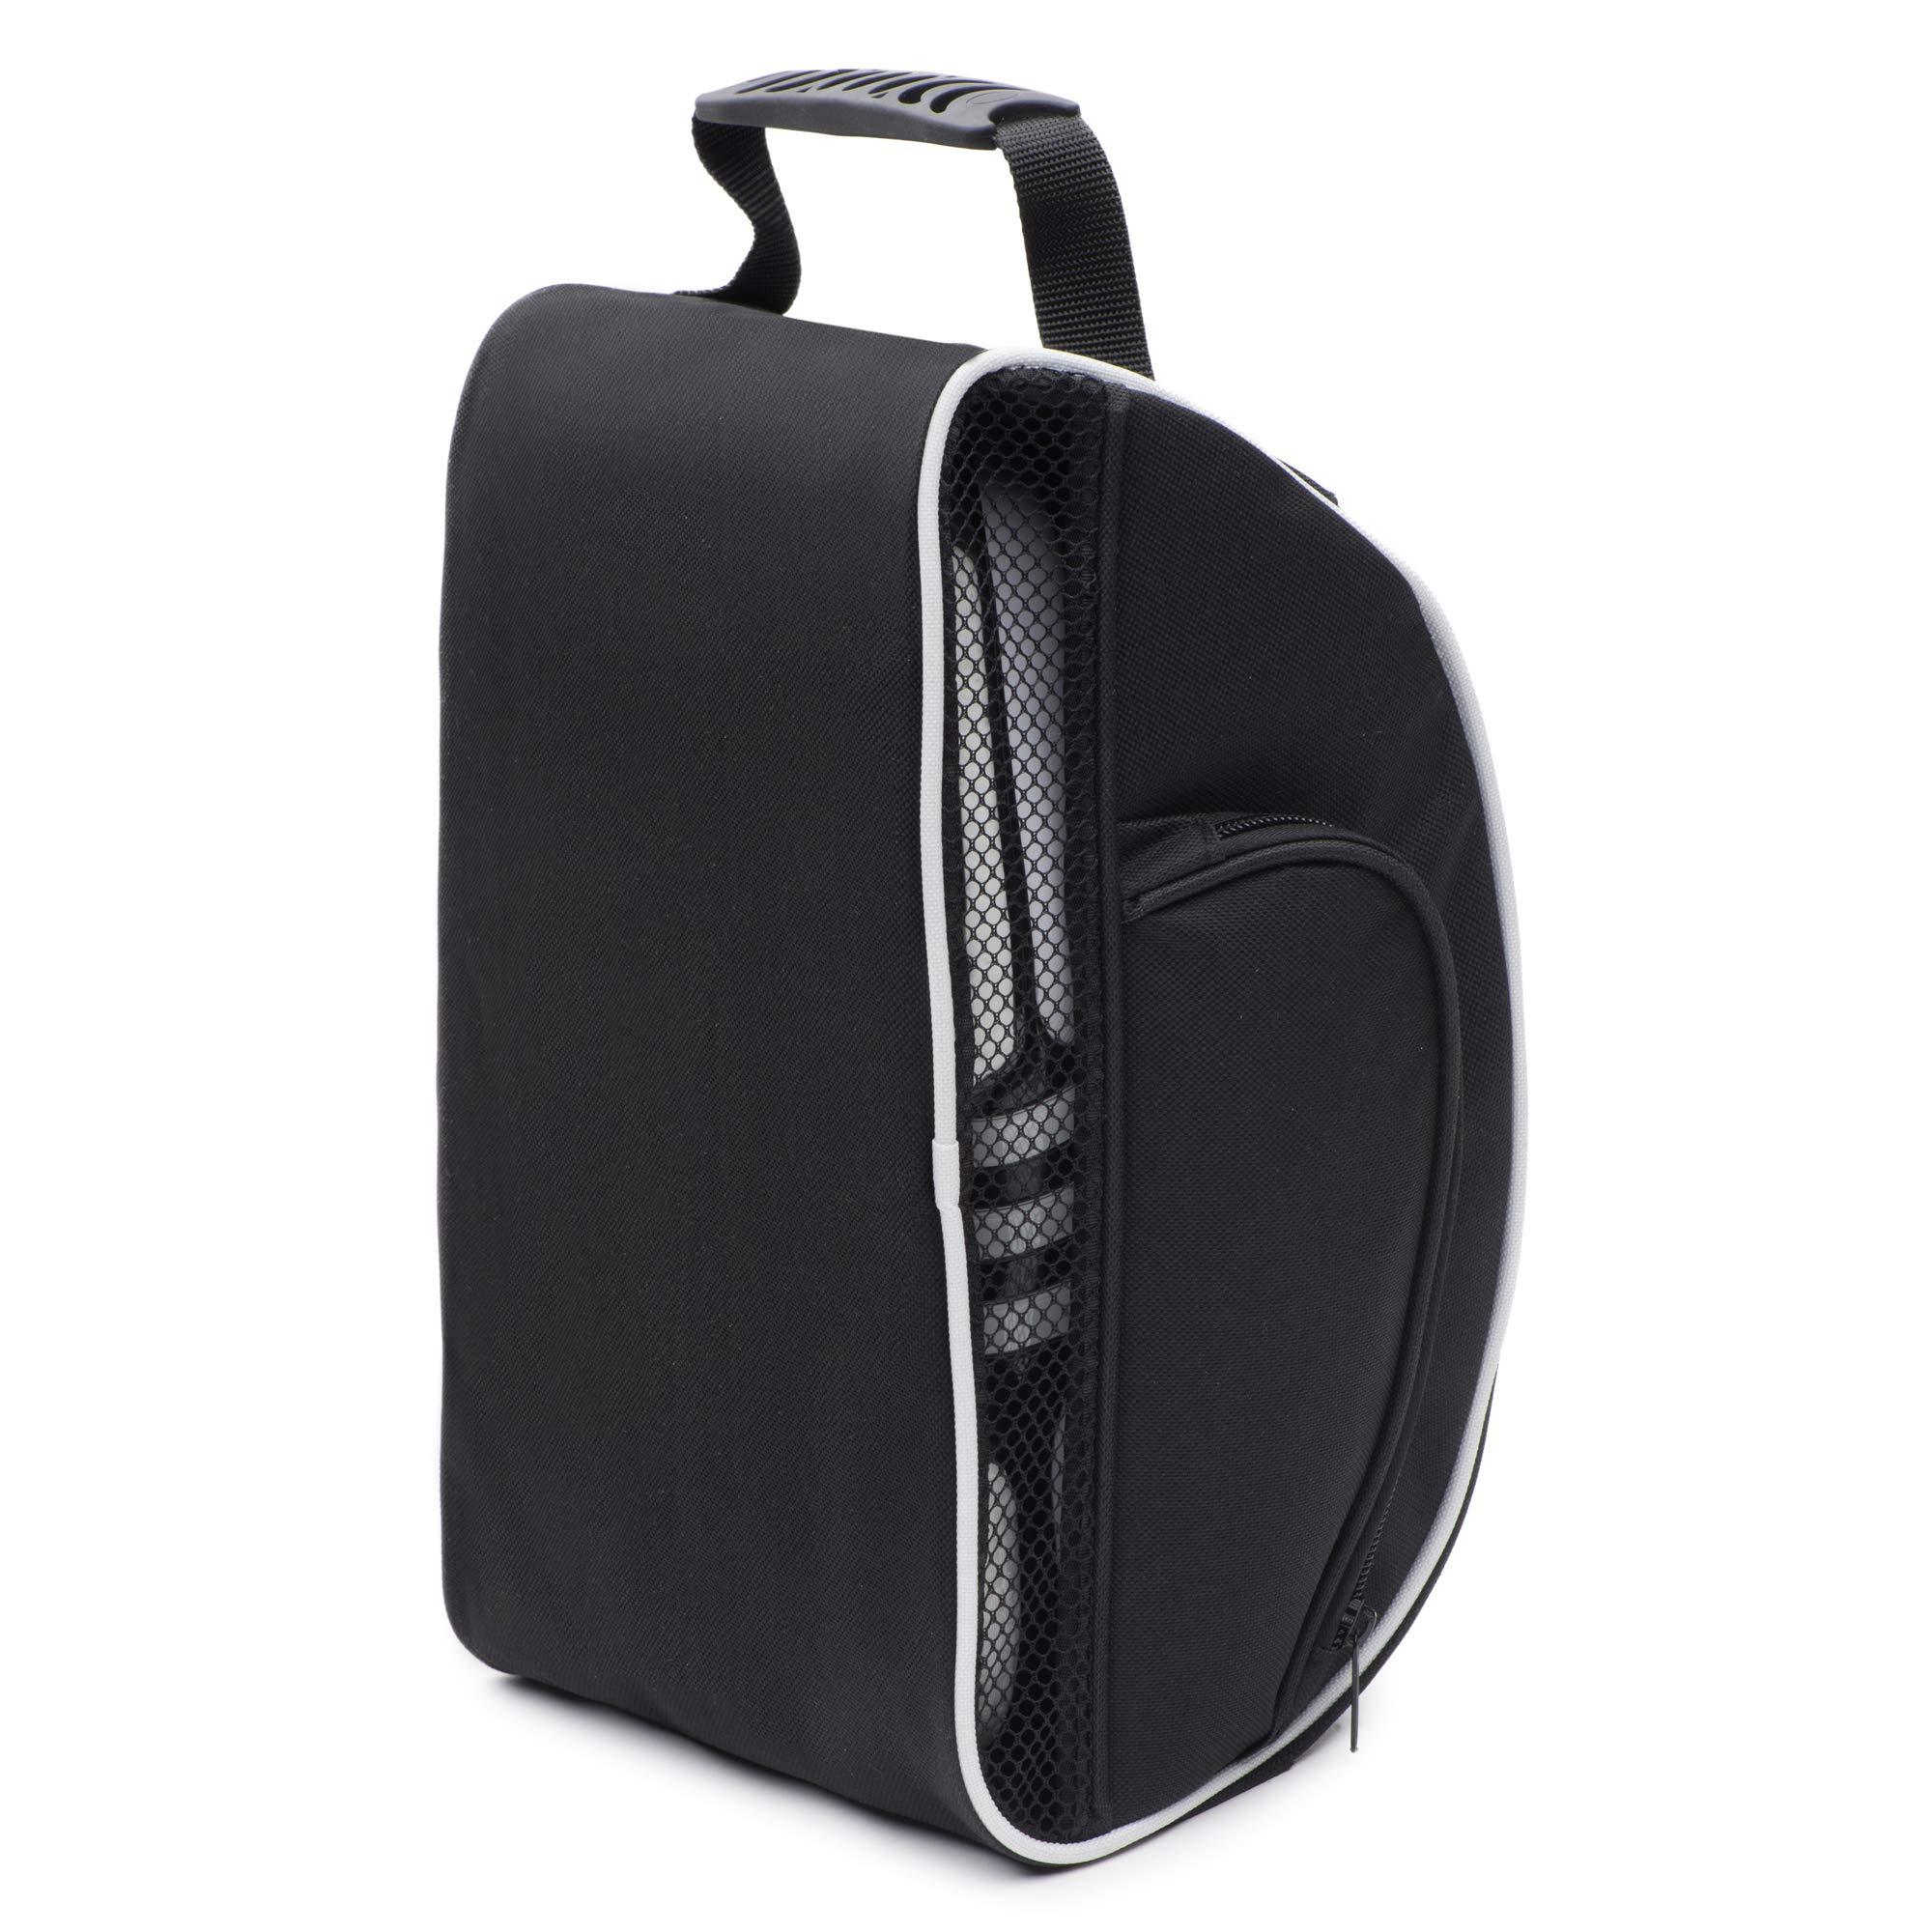 DesignWorks Golf Shoe Bag Tote for Men and Women, Hanging Clip and Large Zippered Side-Pockets, includes Golf Accessories Bonus by DesignWorks (Image #8)